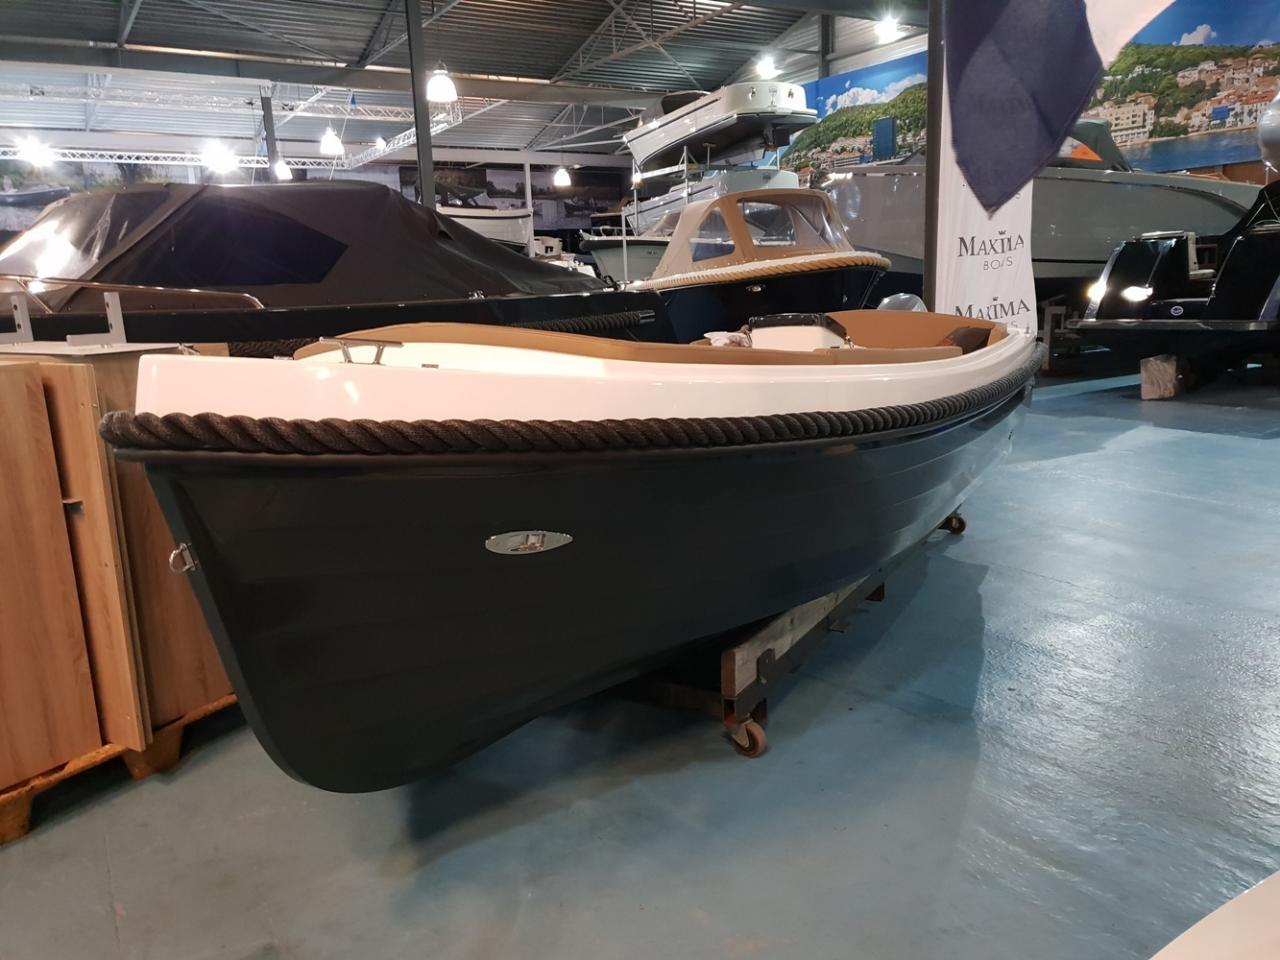 Maxima 485 met 10 pk Honda outboard motor 3